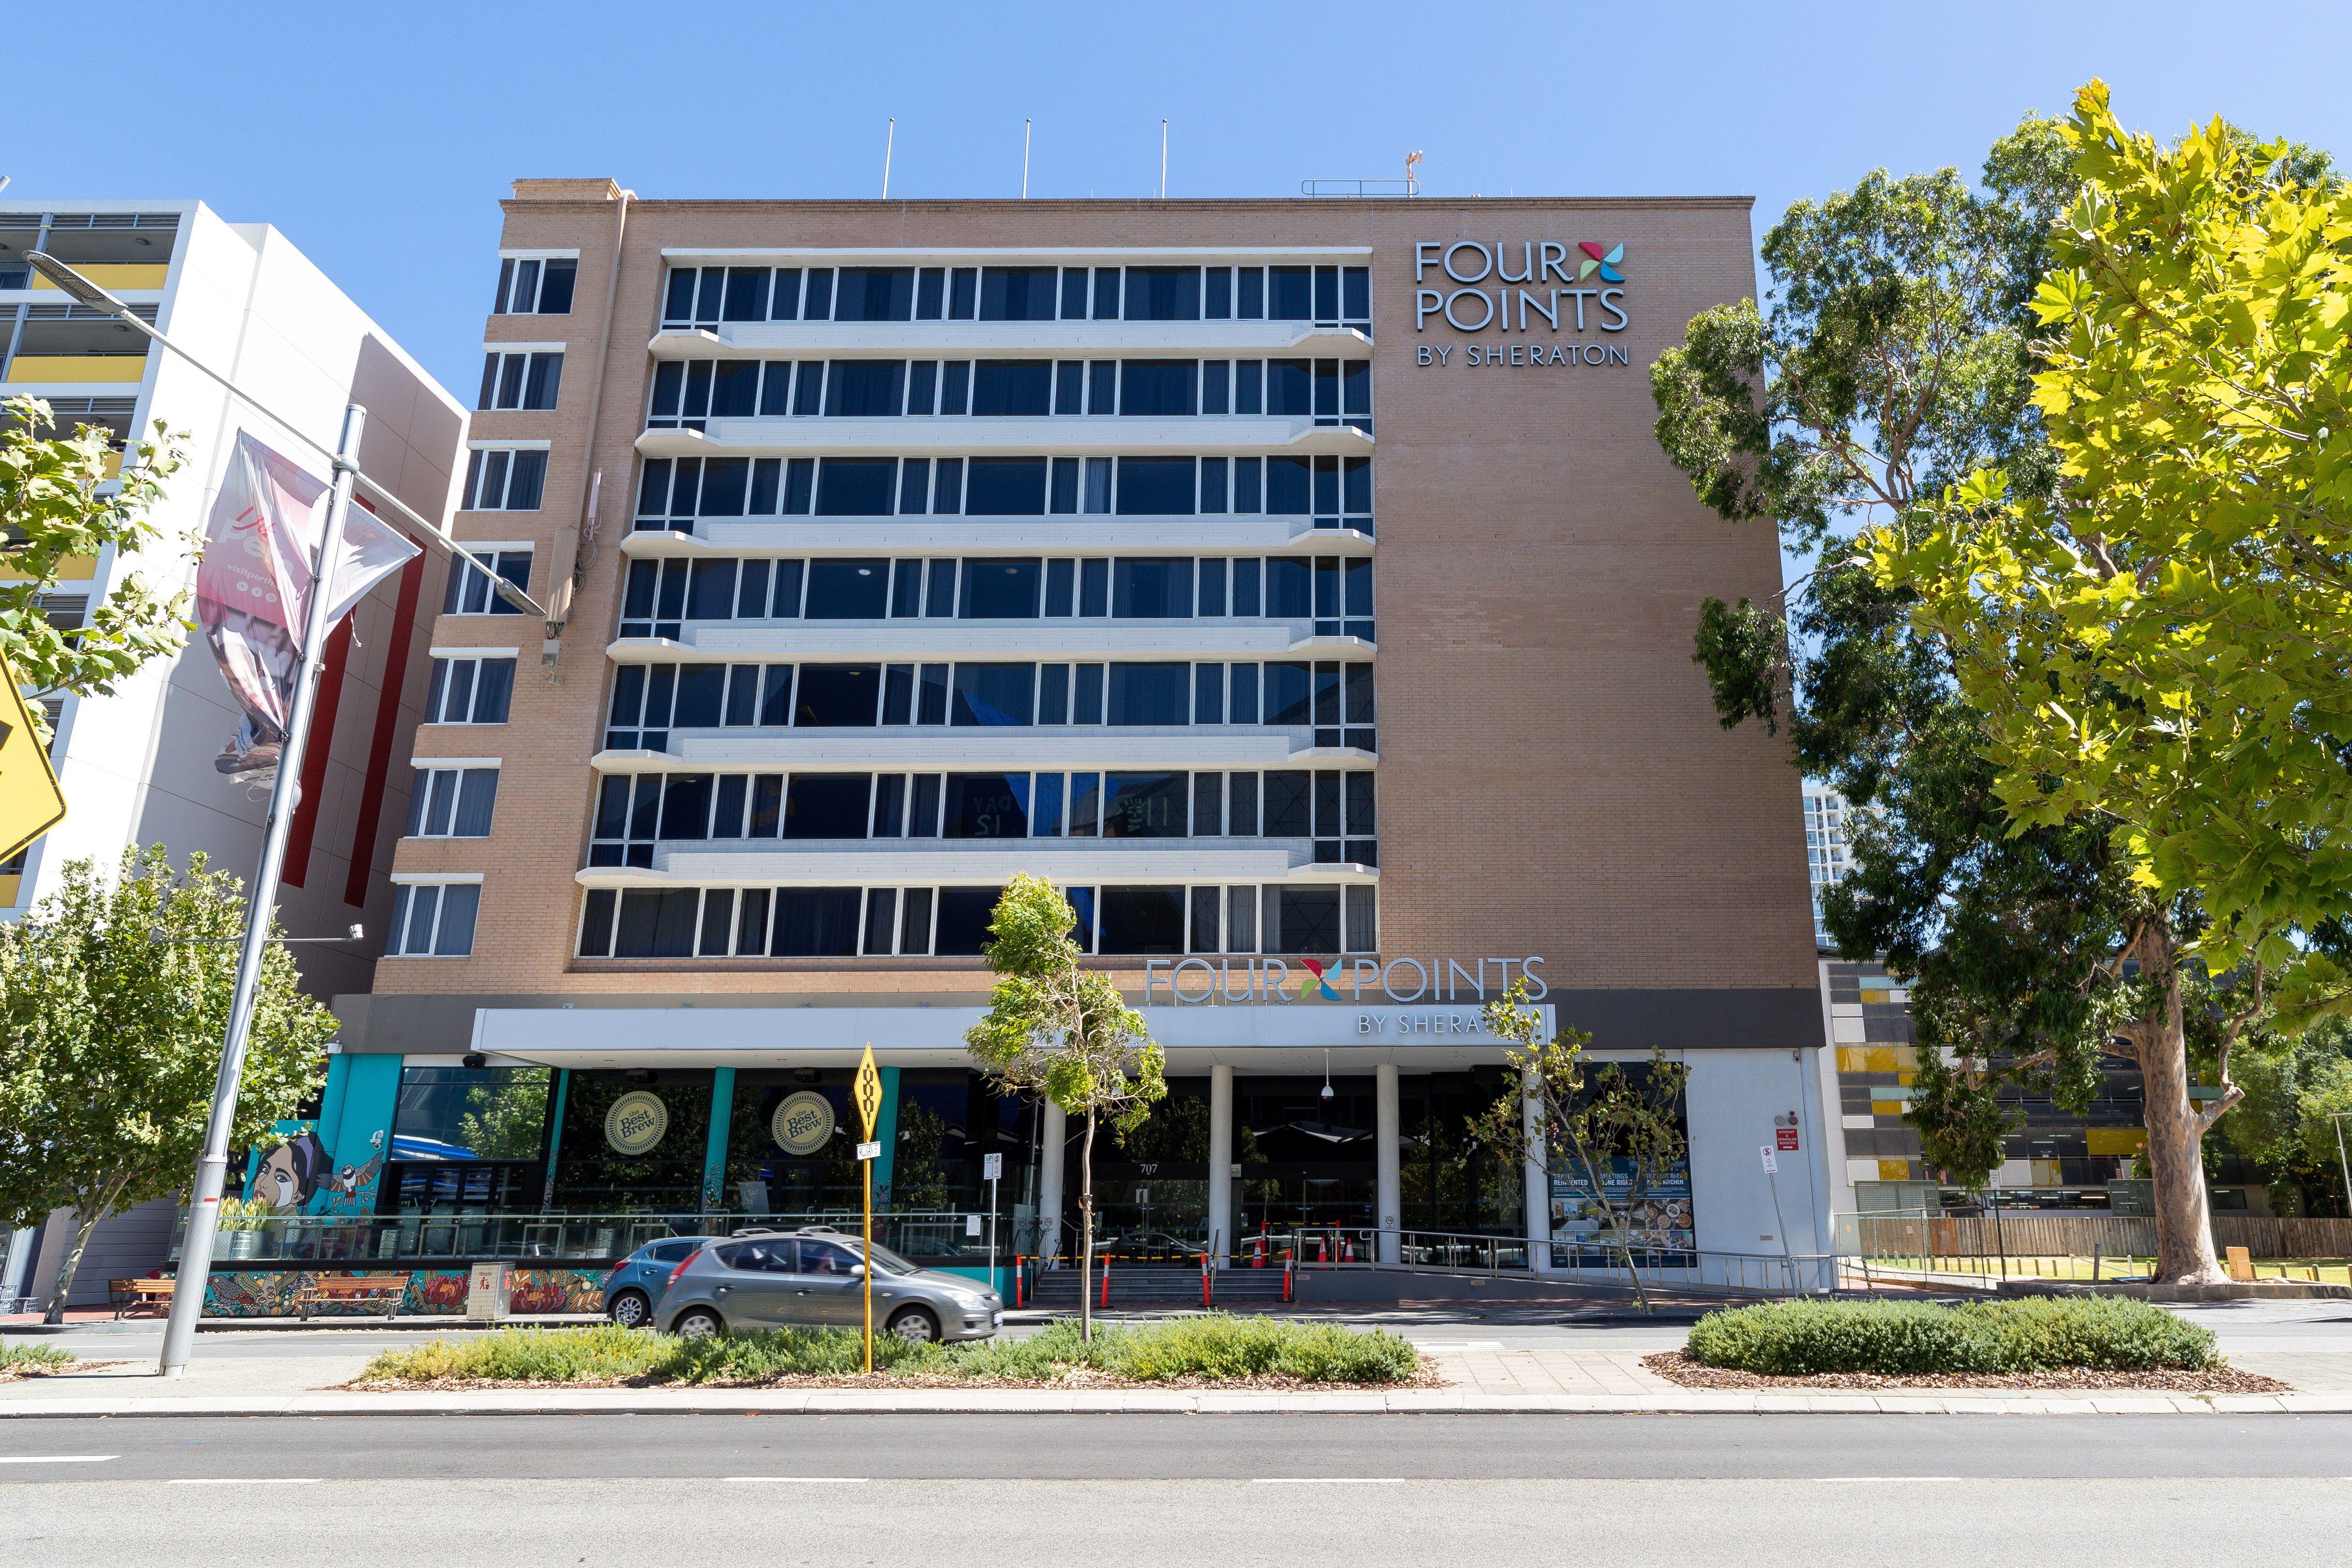 Fachada principal del hotel Four Points Sheraton de Perth, Australia. EFE/EPA/RICHARD WAINWRIGHT